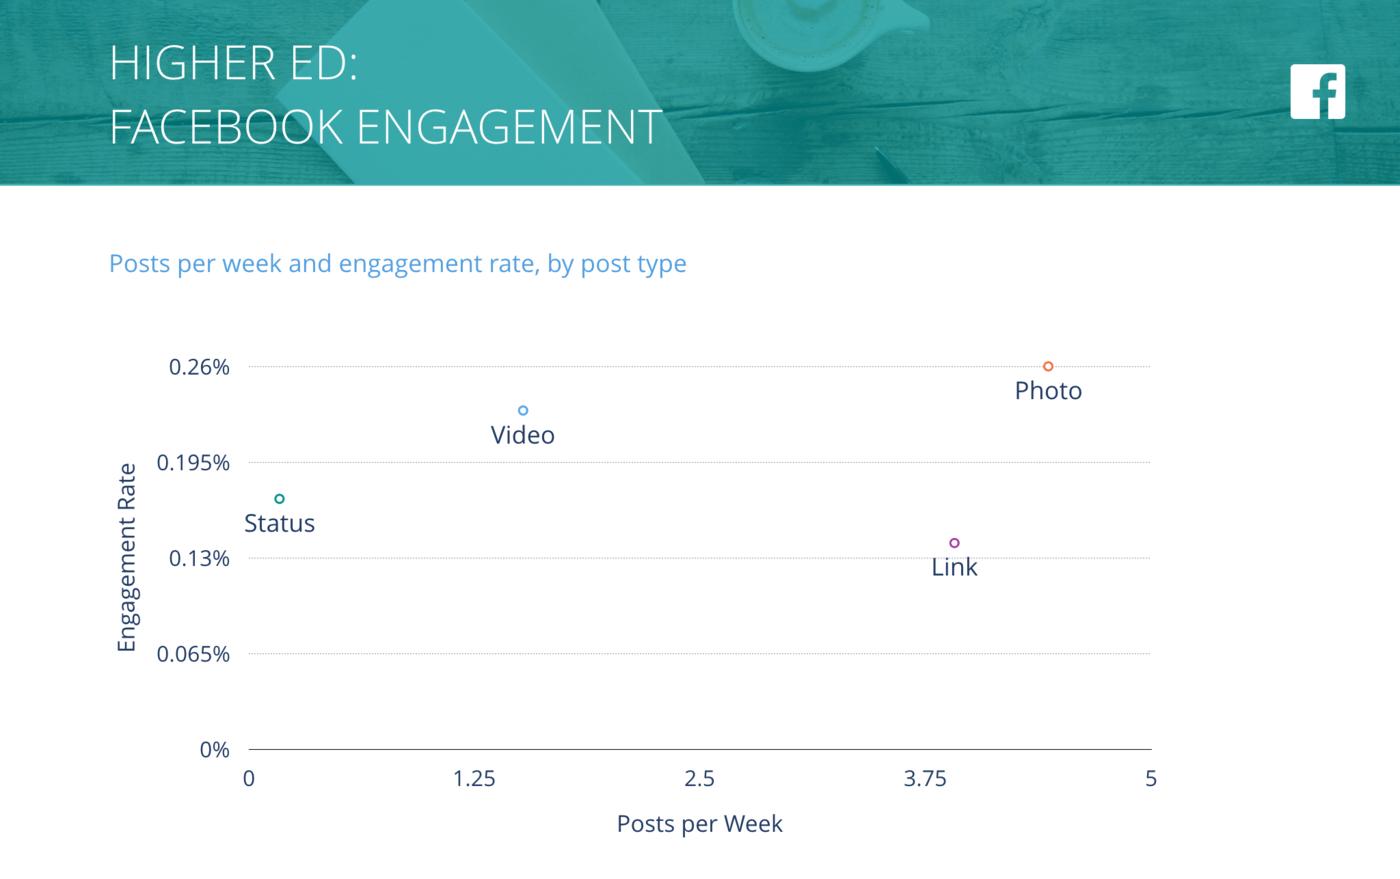 slide for Facebook Posts per Week vs. Engagement Rate per Post, Higher Ed